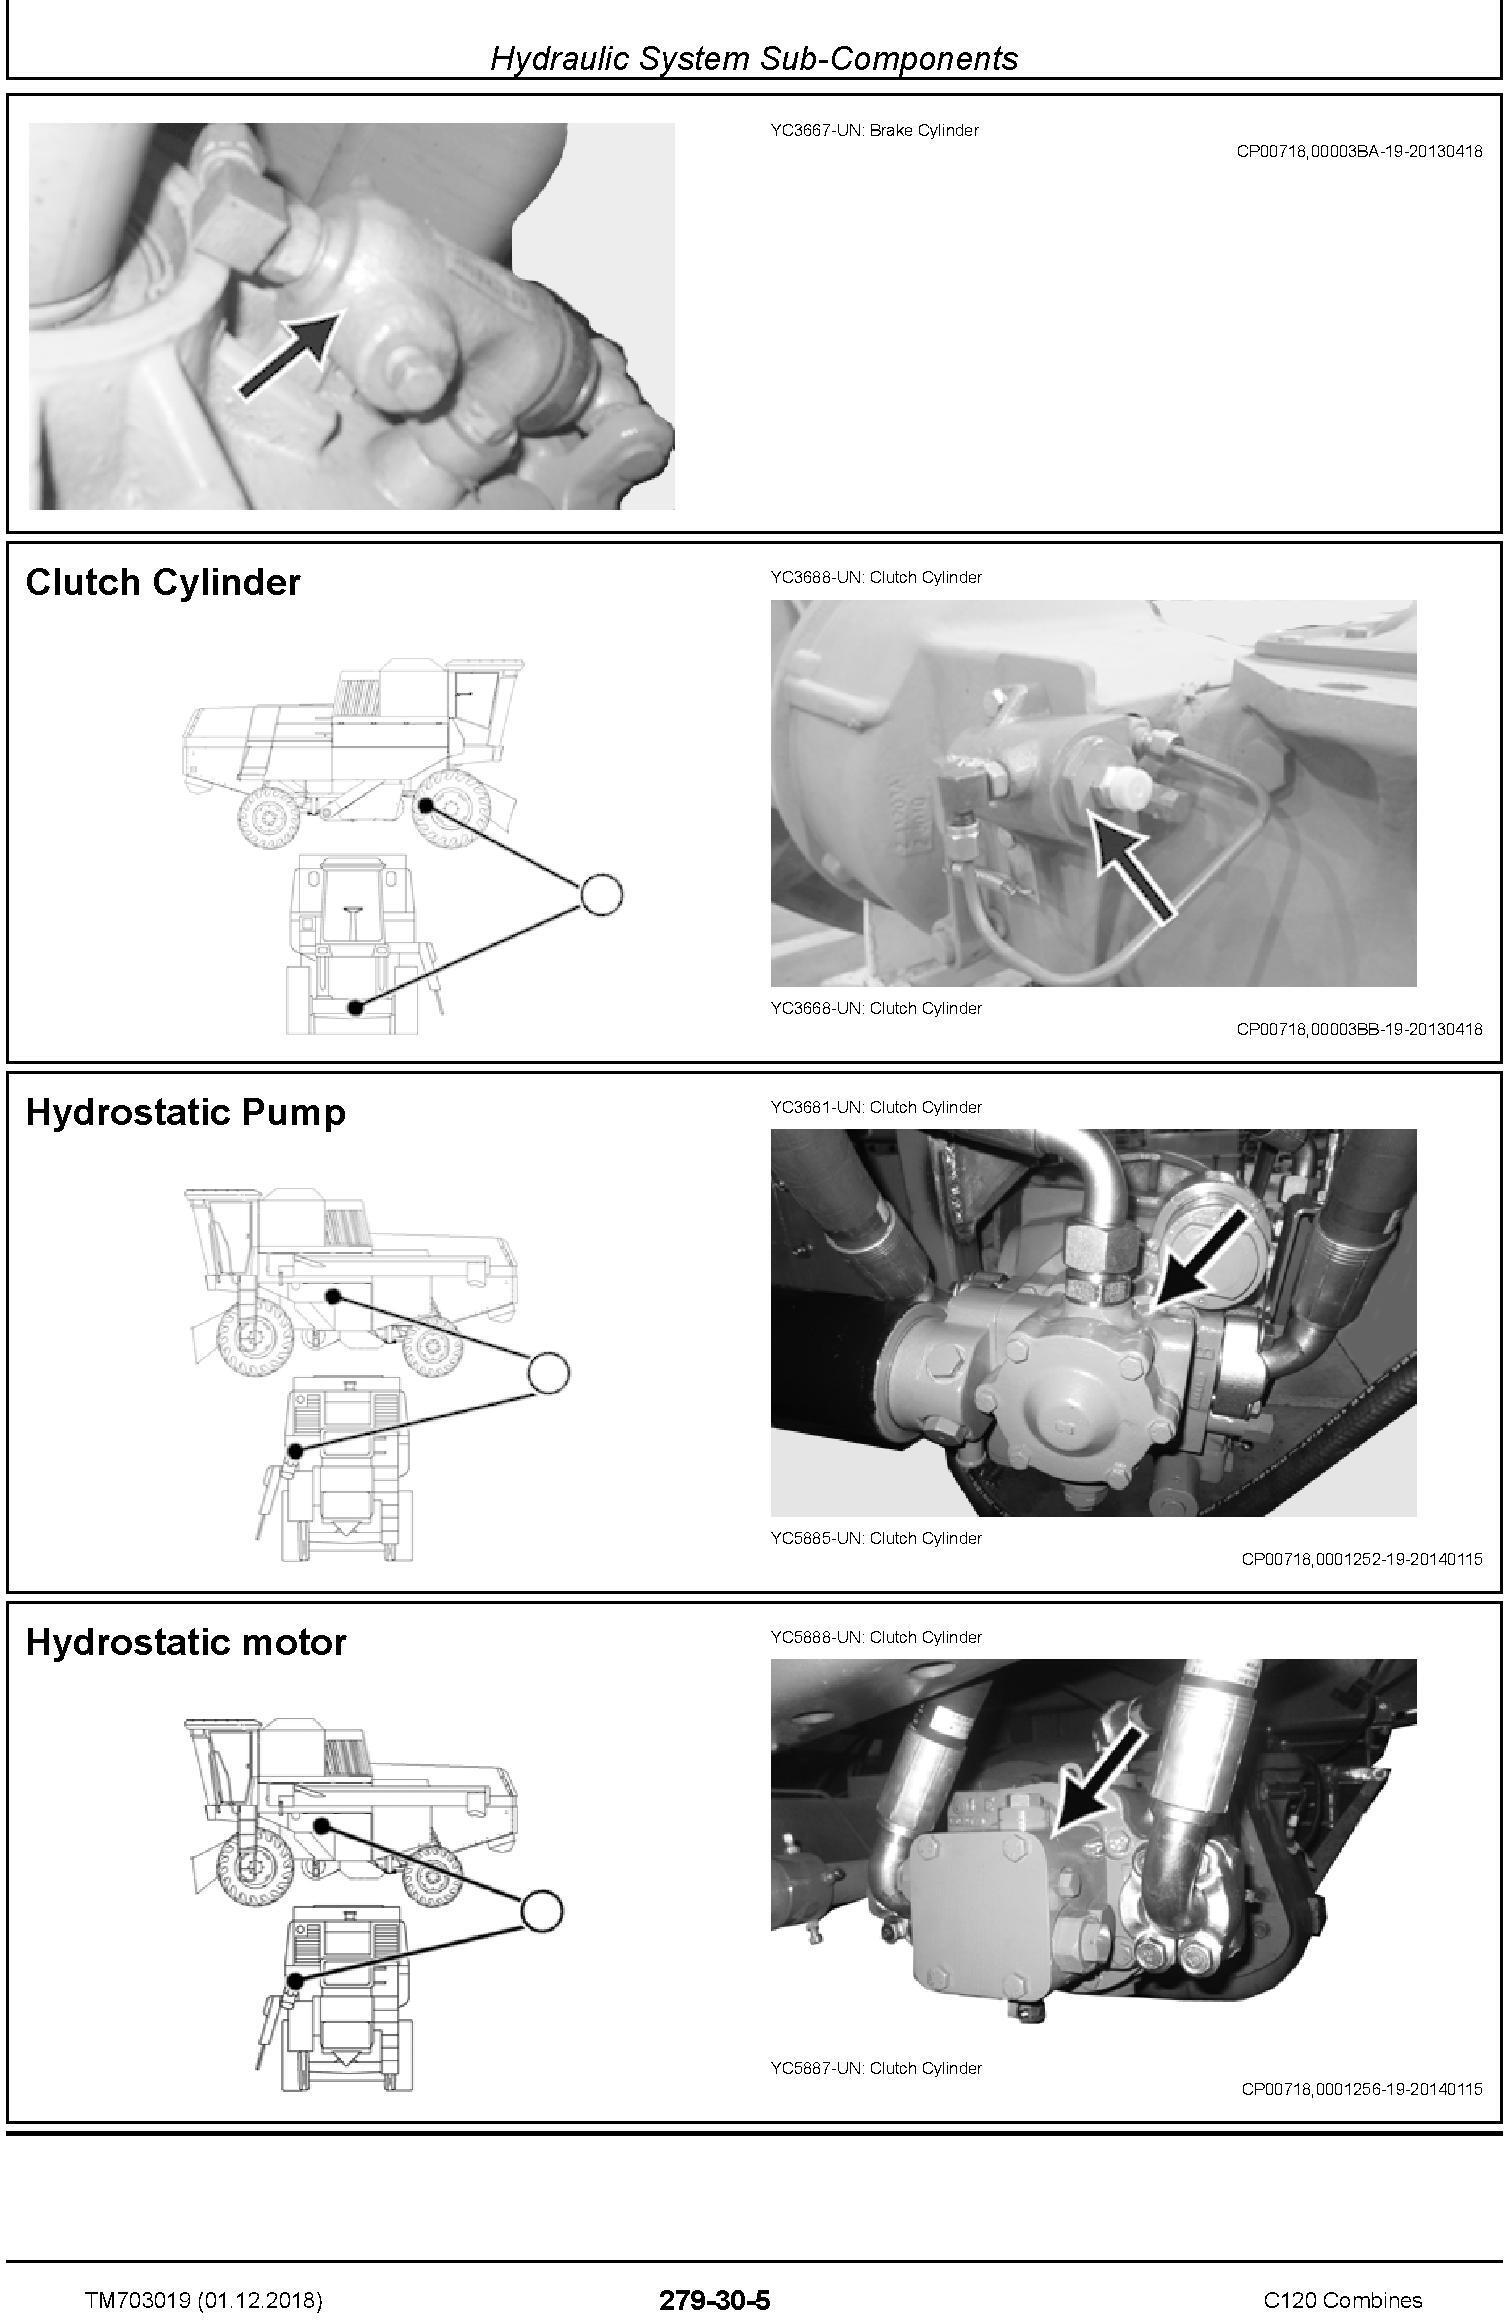 John Deere C120 Combines (Asian Edition) Technical Service Manual (TM703019) - 2